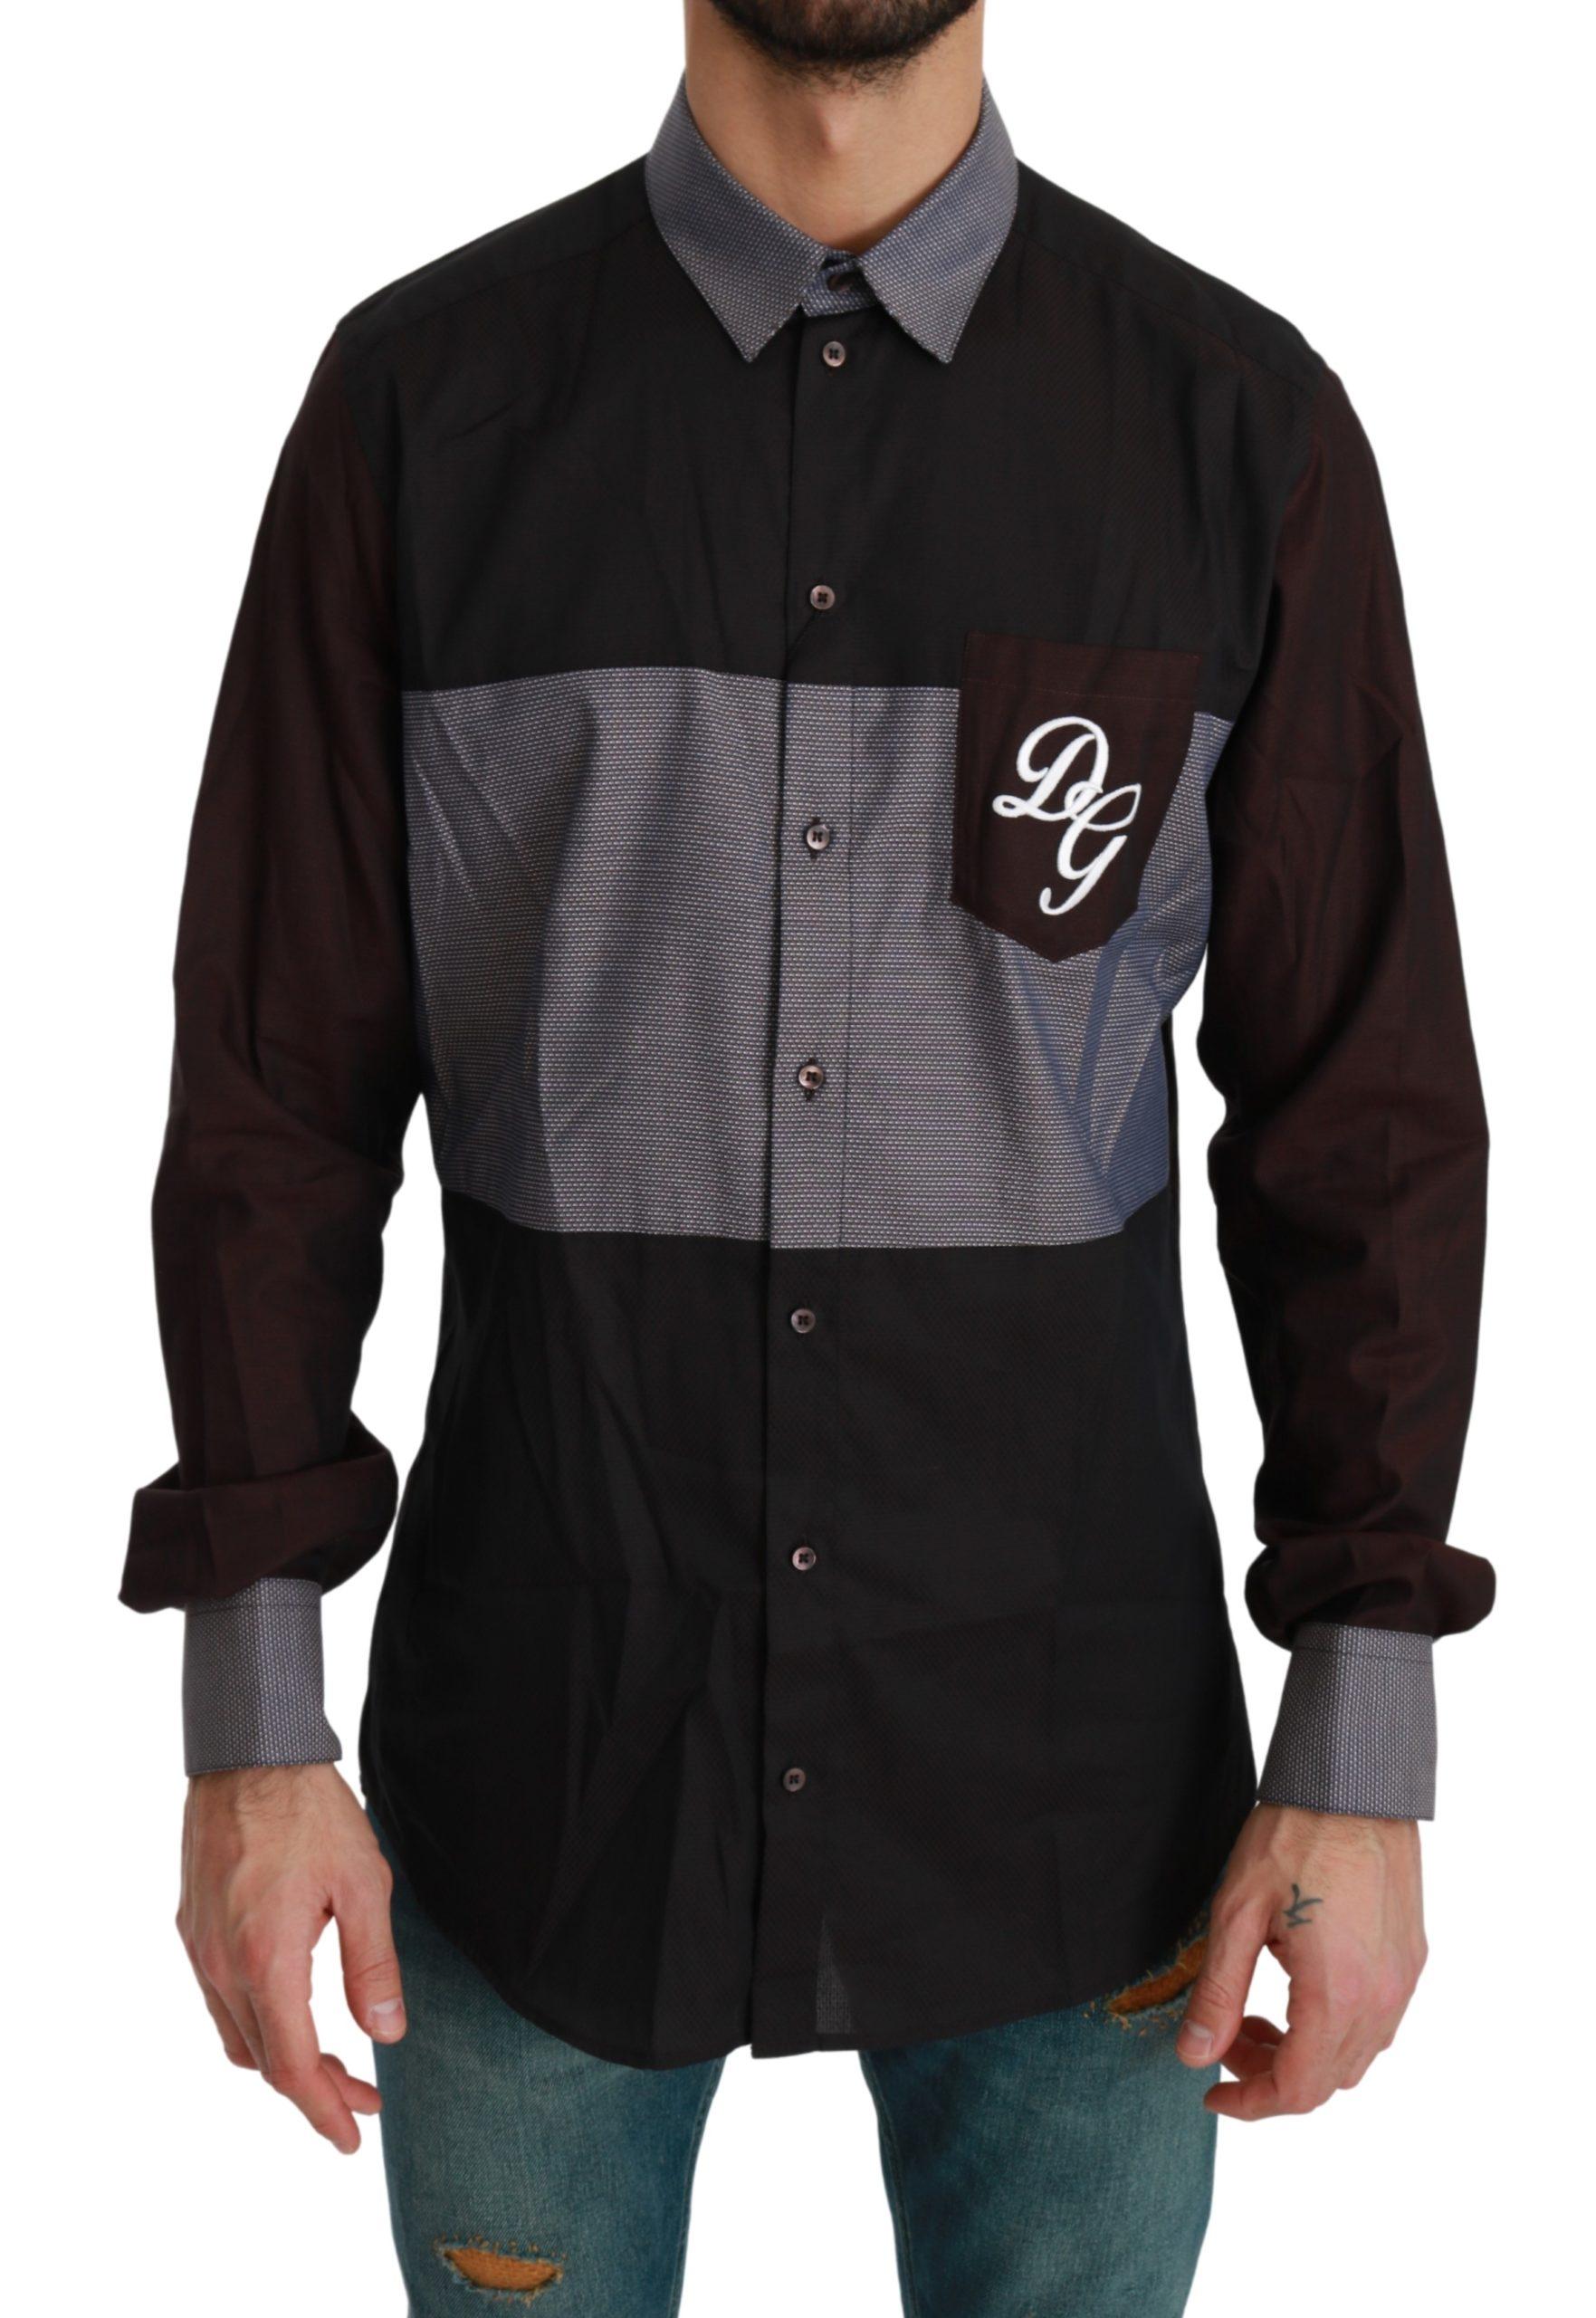 Dolce & Gabbana Men's DG Dress Cotton Shirt Bordeaux TSH4514 - IT37 | XS